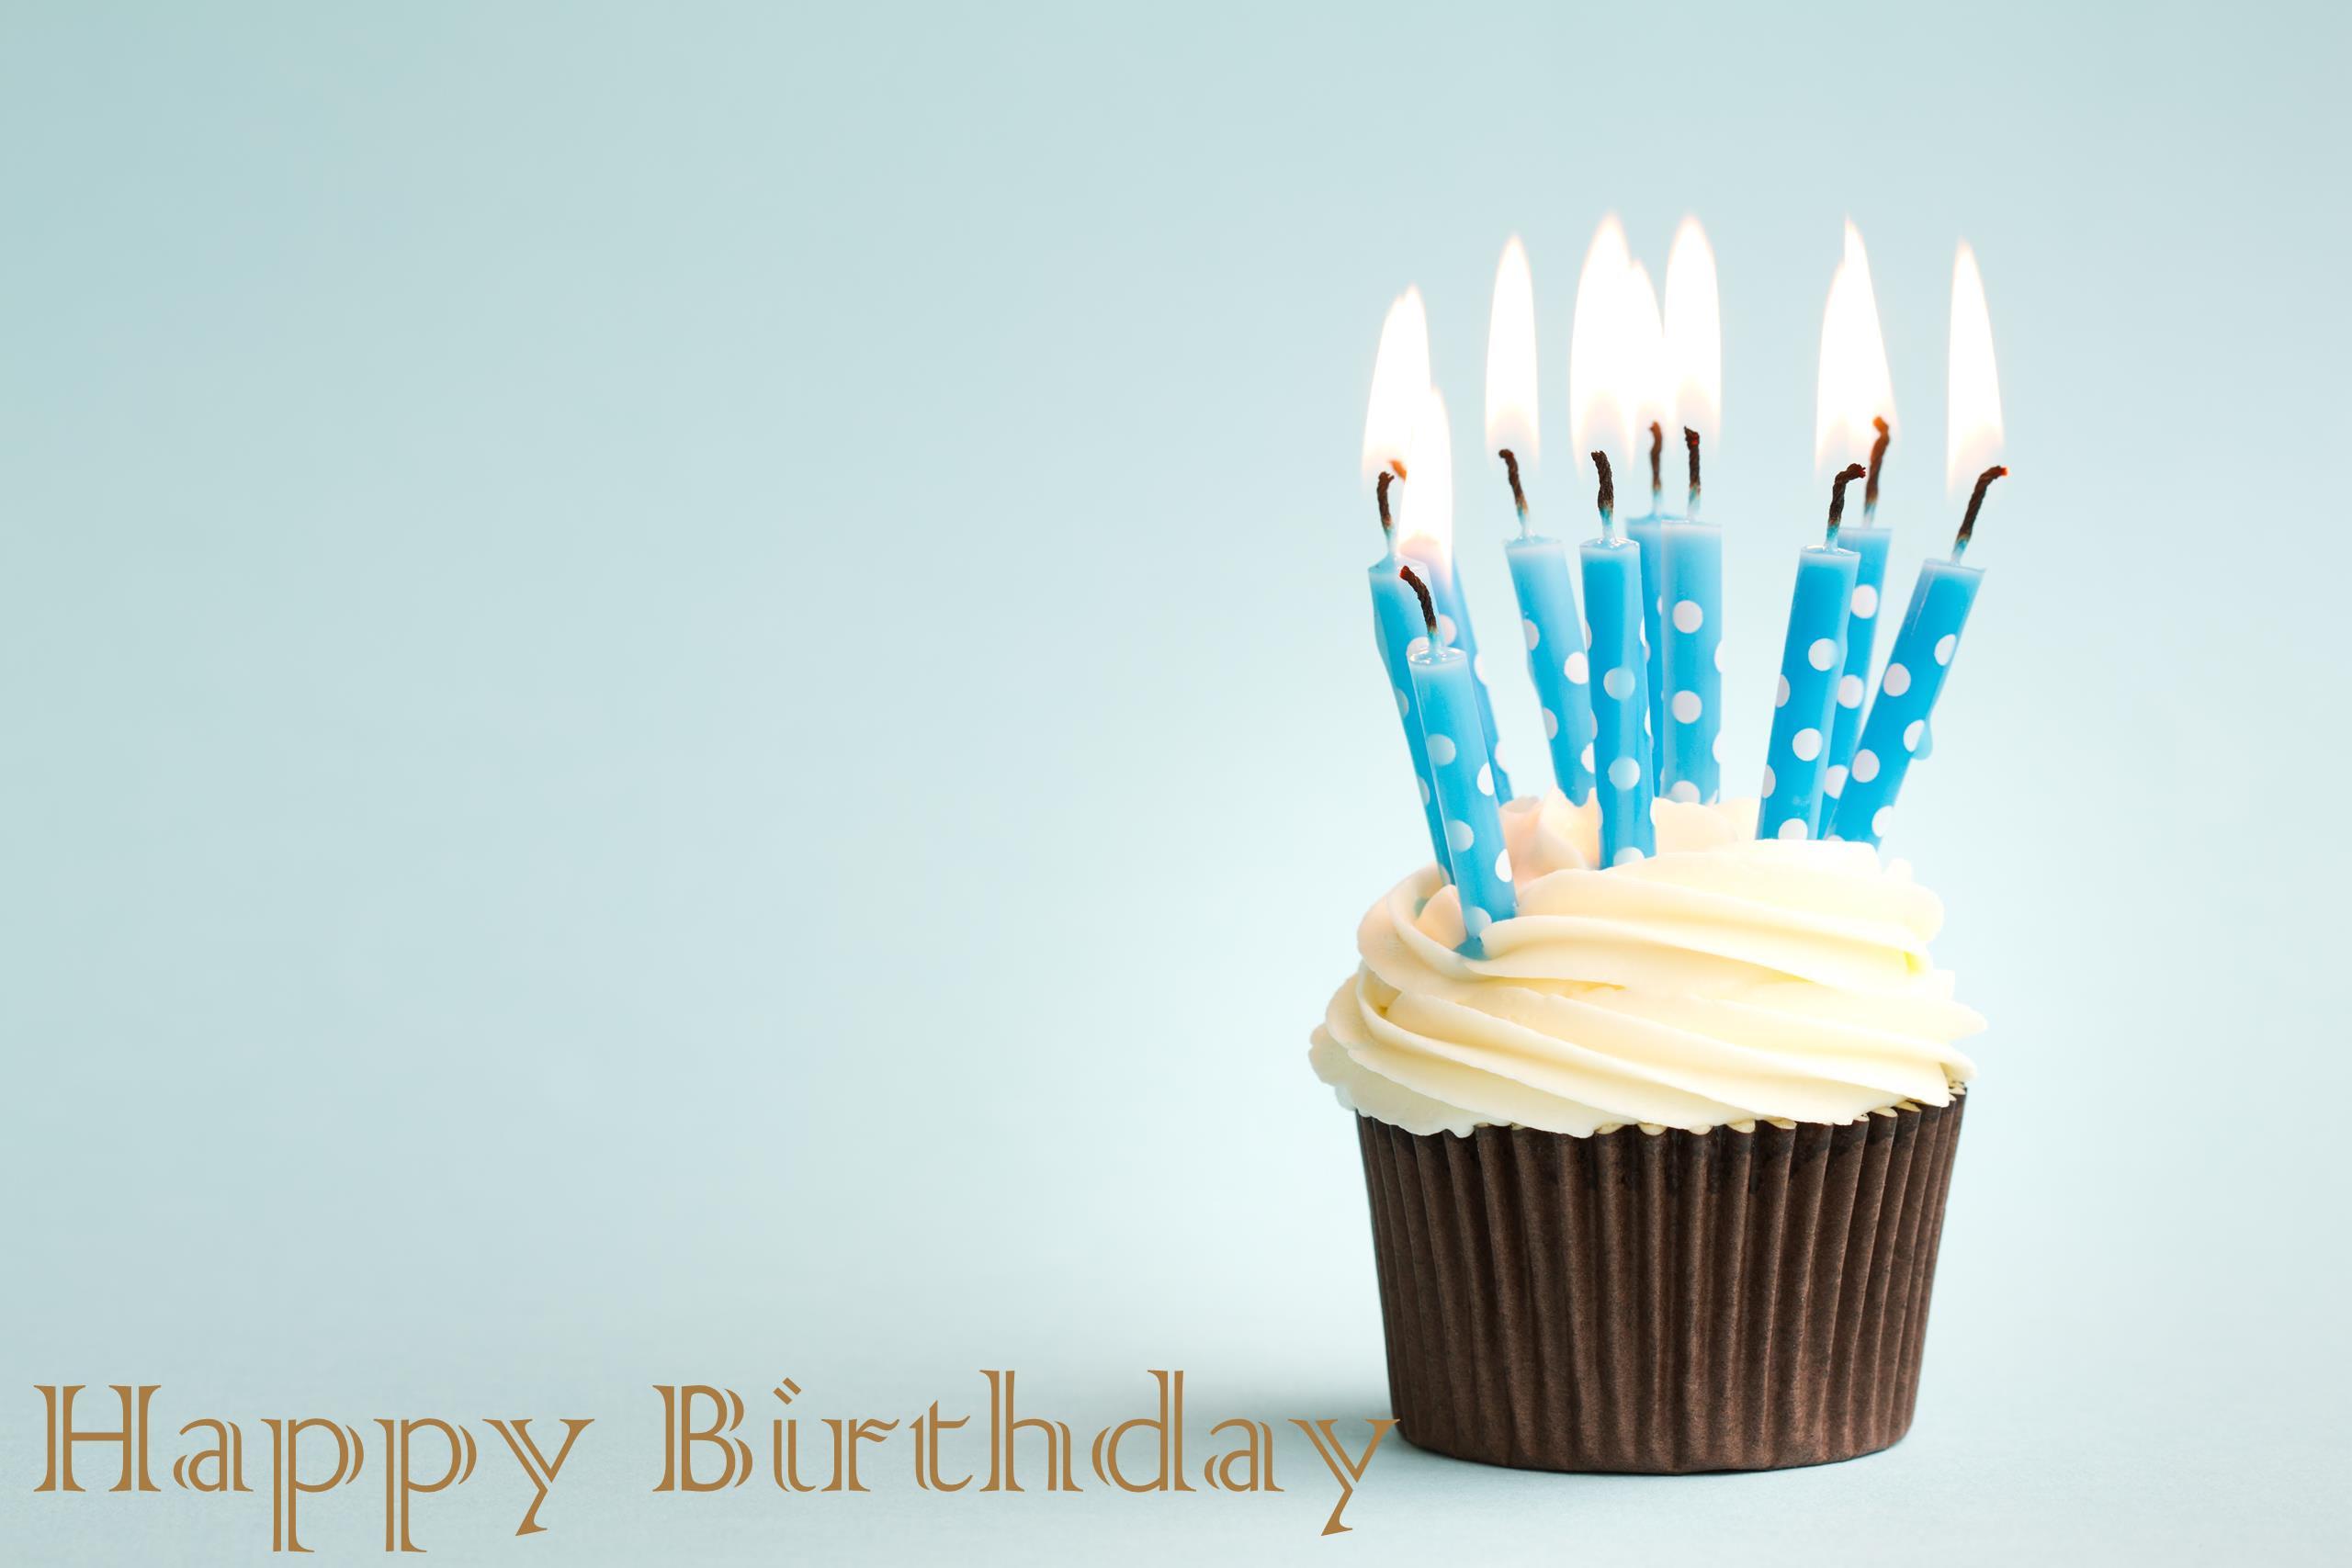 Happy Birthday Free Desktop Wallpaper Wallpaperspick Com